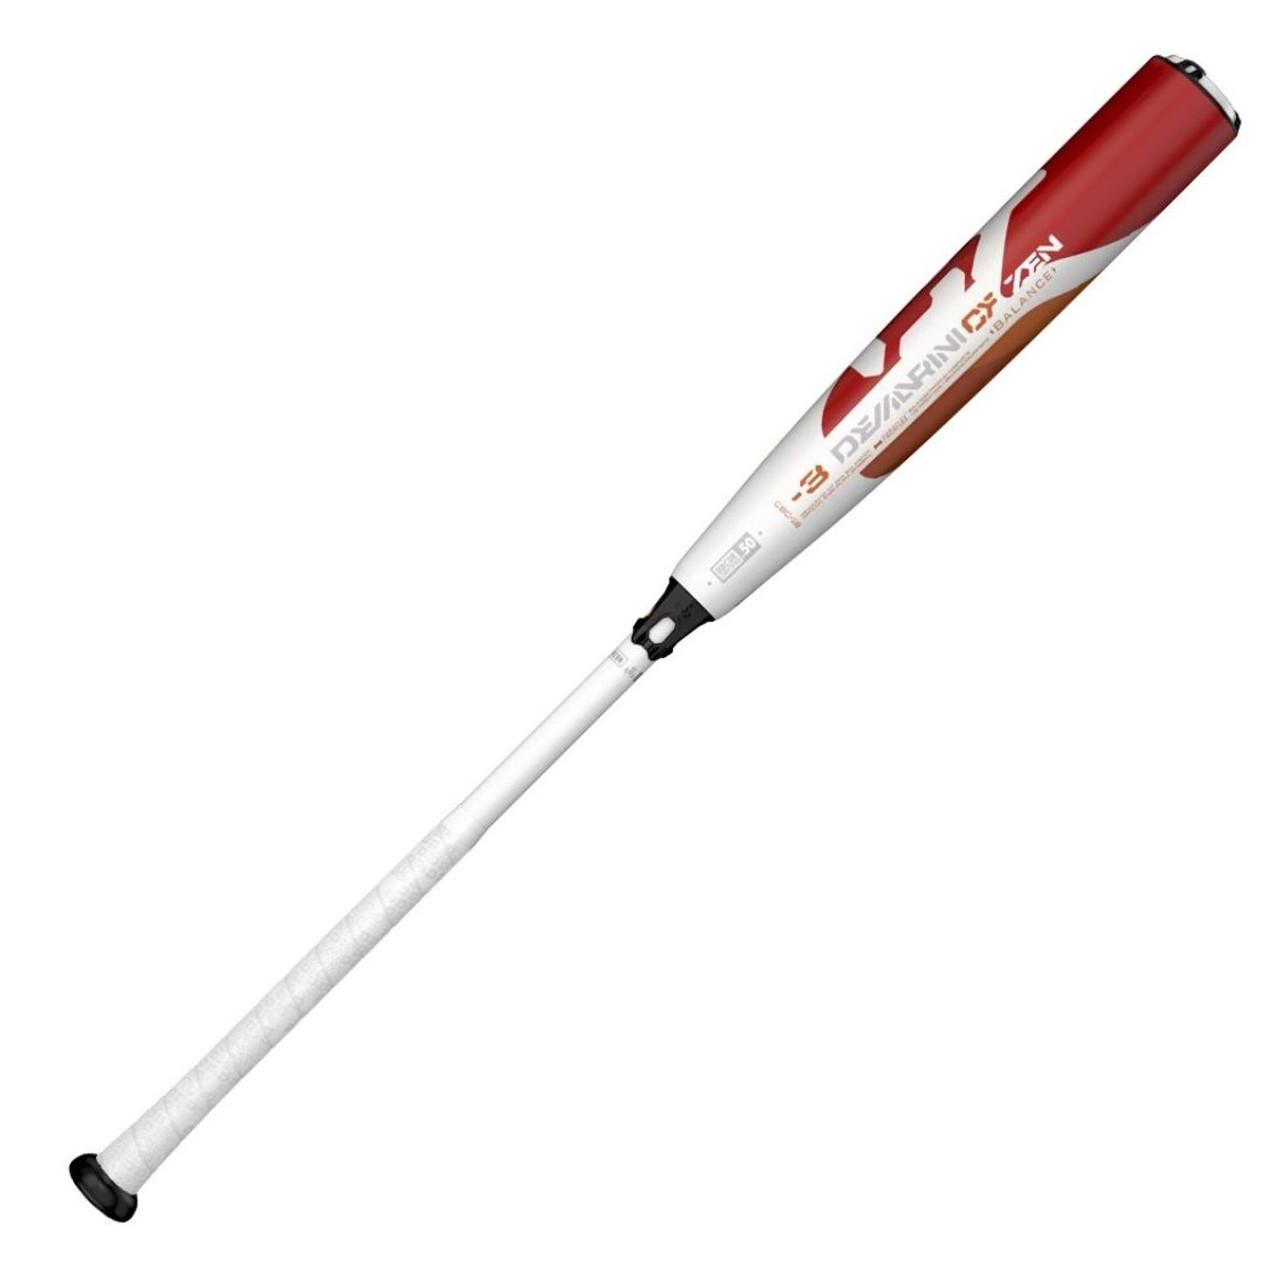 2018 DeMarini CF Zen BBCOR Balanced Baseball Bat (-3) - Legends Athletic  Supply 0d43c9a03